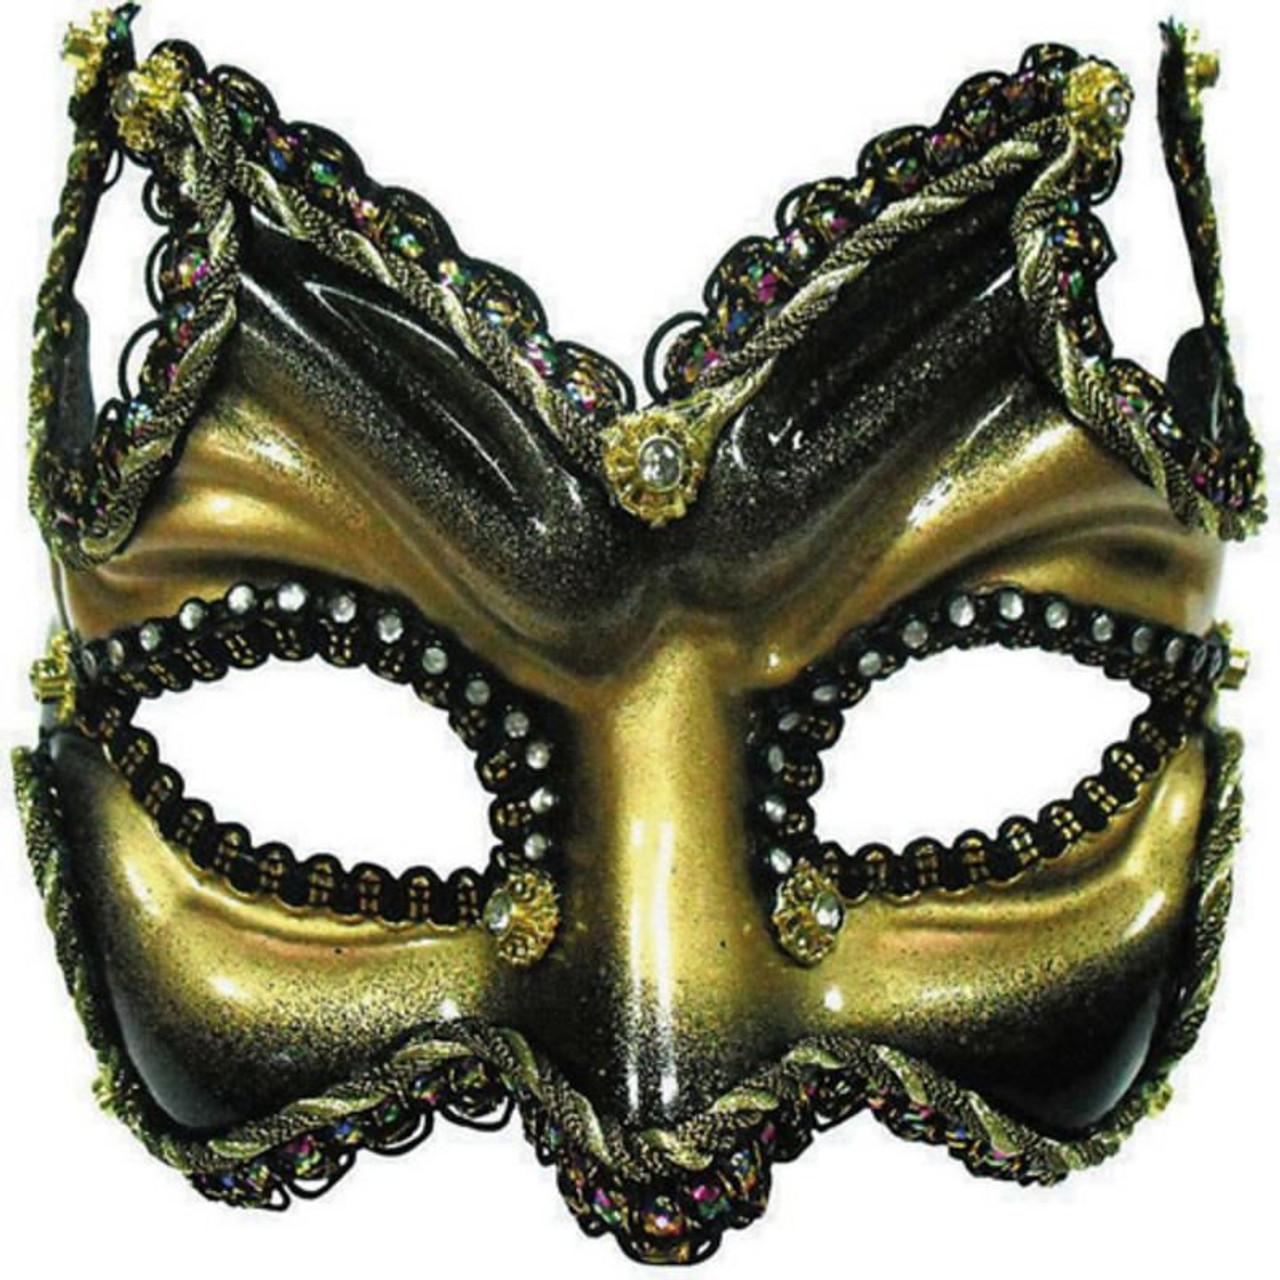 Morphsuit orange face mask; fancy dress; costume party; face mask